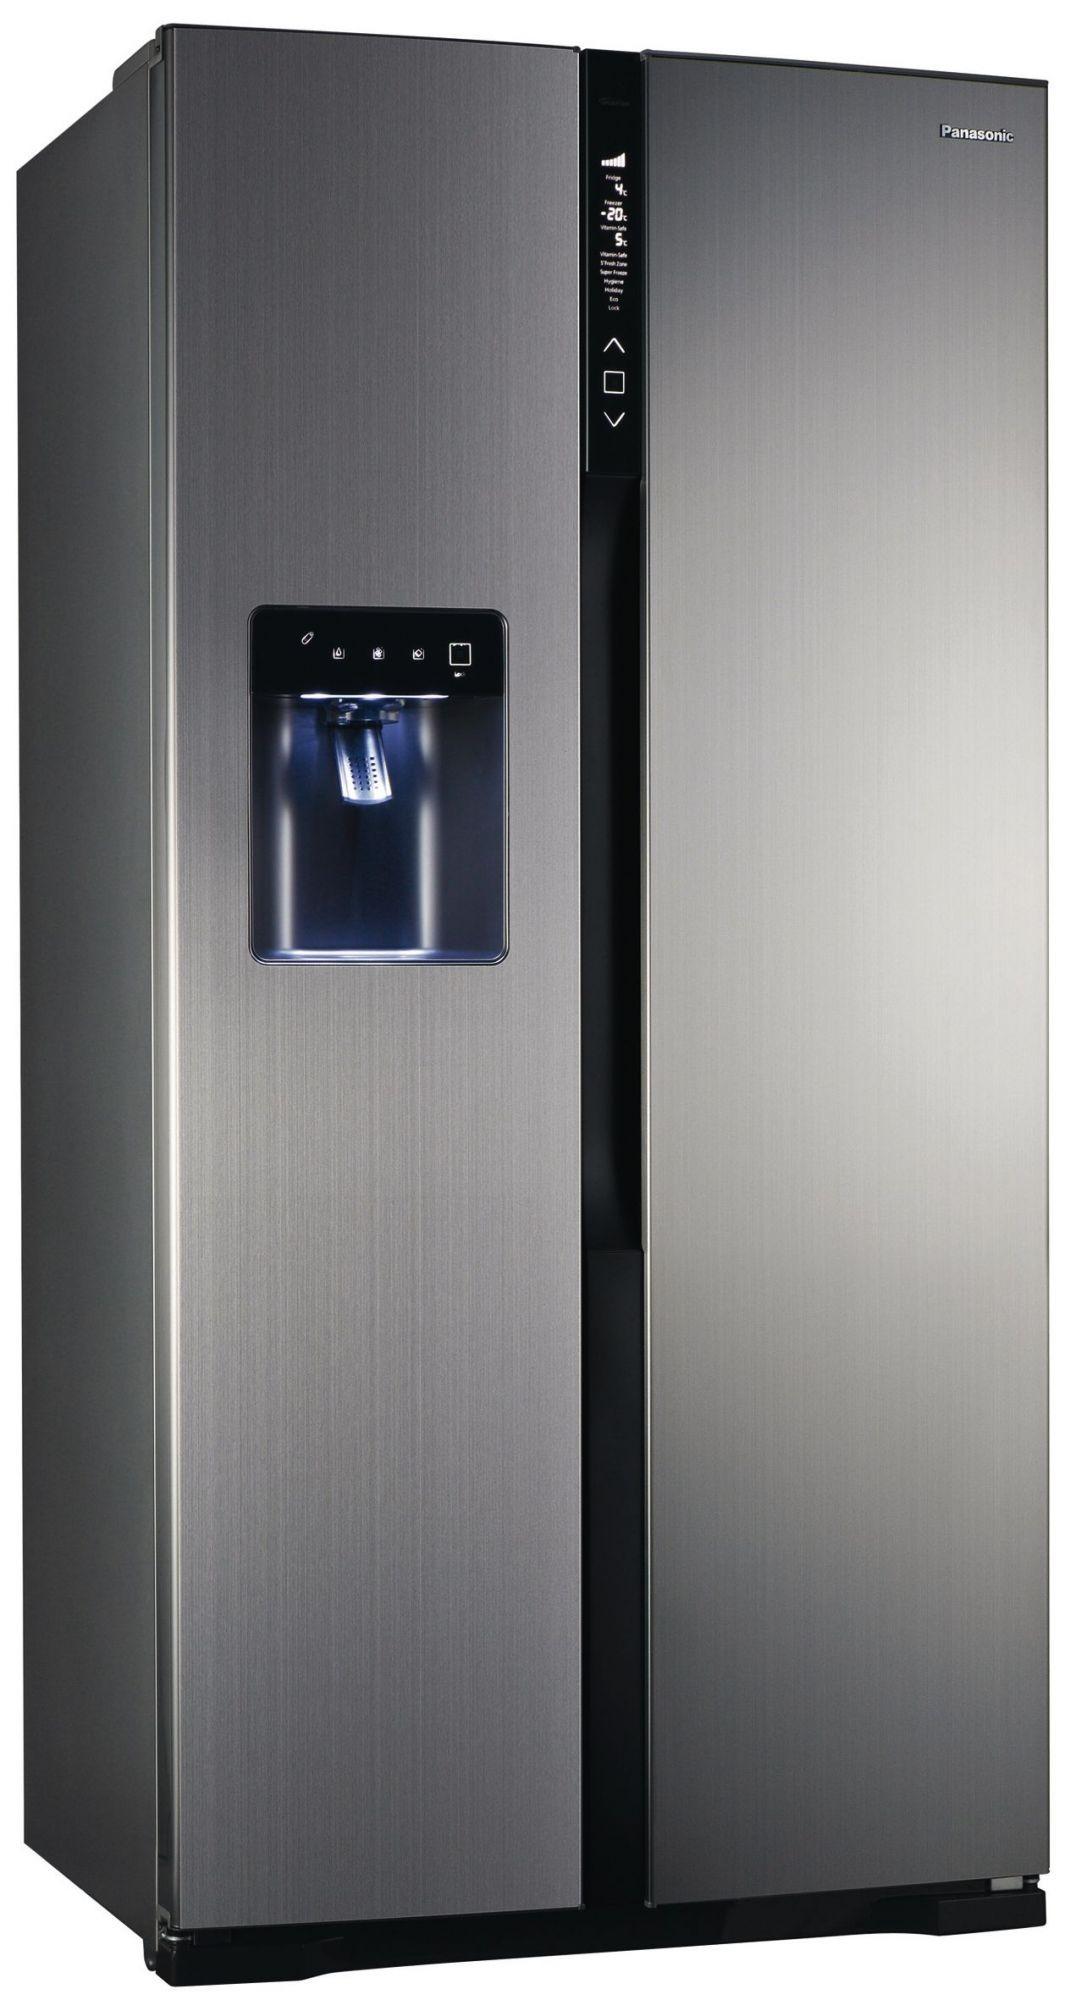 nr b53v1 xe edelstahl panasonic elektro gro ger te side by side. Black Bedroom Furniture Sets. Home Design Ideas